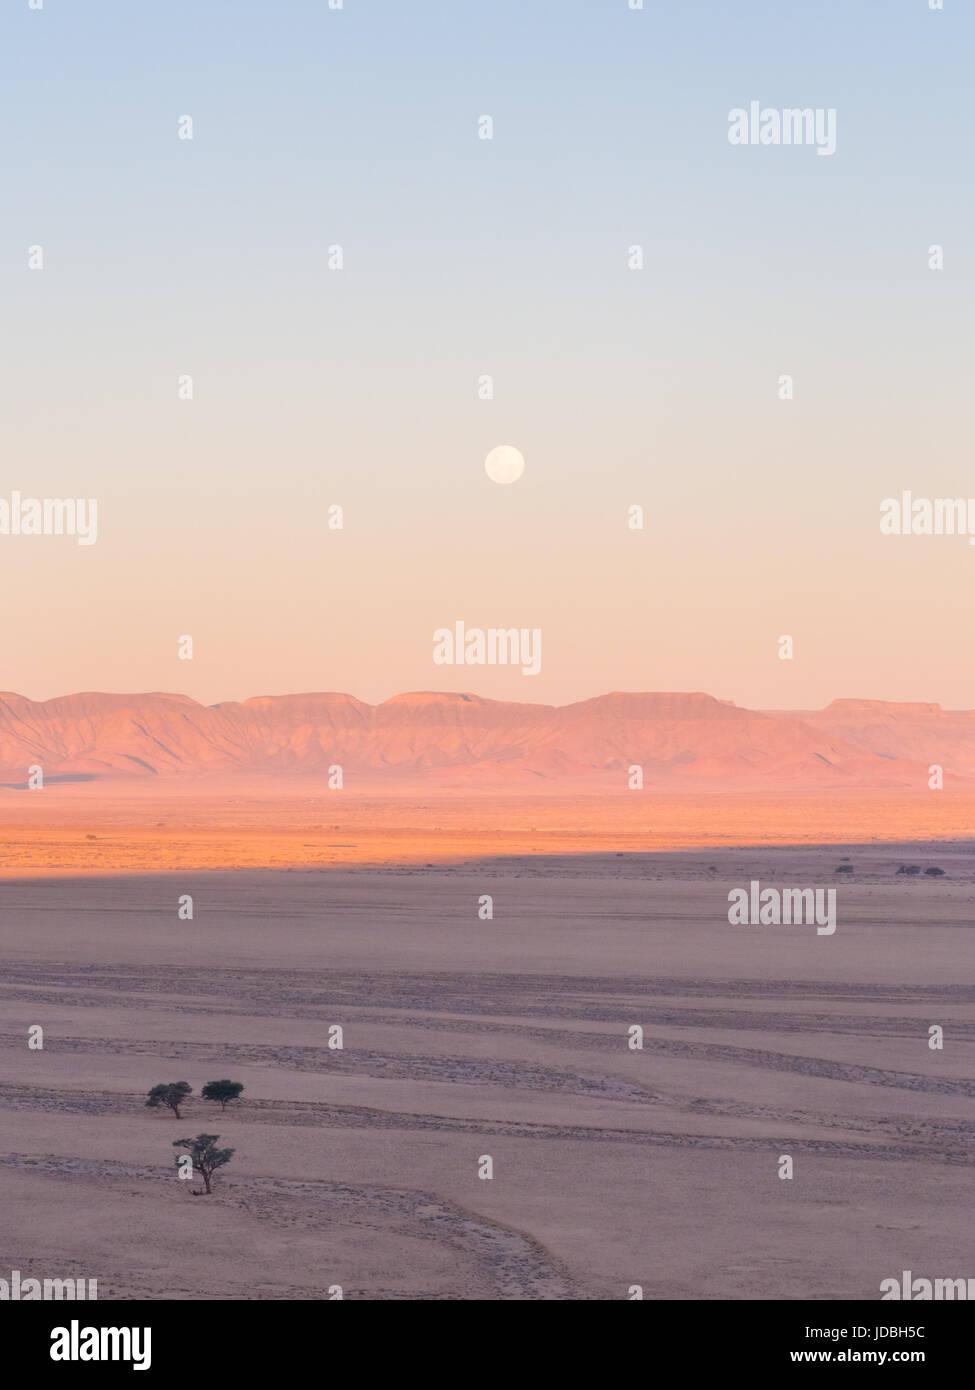 Ione del paesaggio del deserto del Namib n Namib-Naukluft National Park, Namibia, Africa, al tramonto. Foto Stock